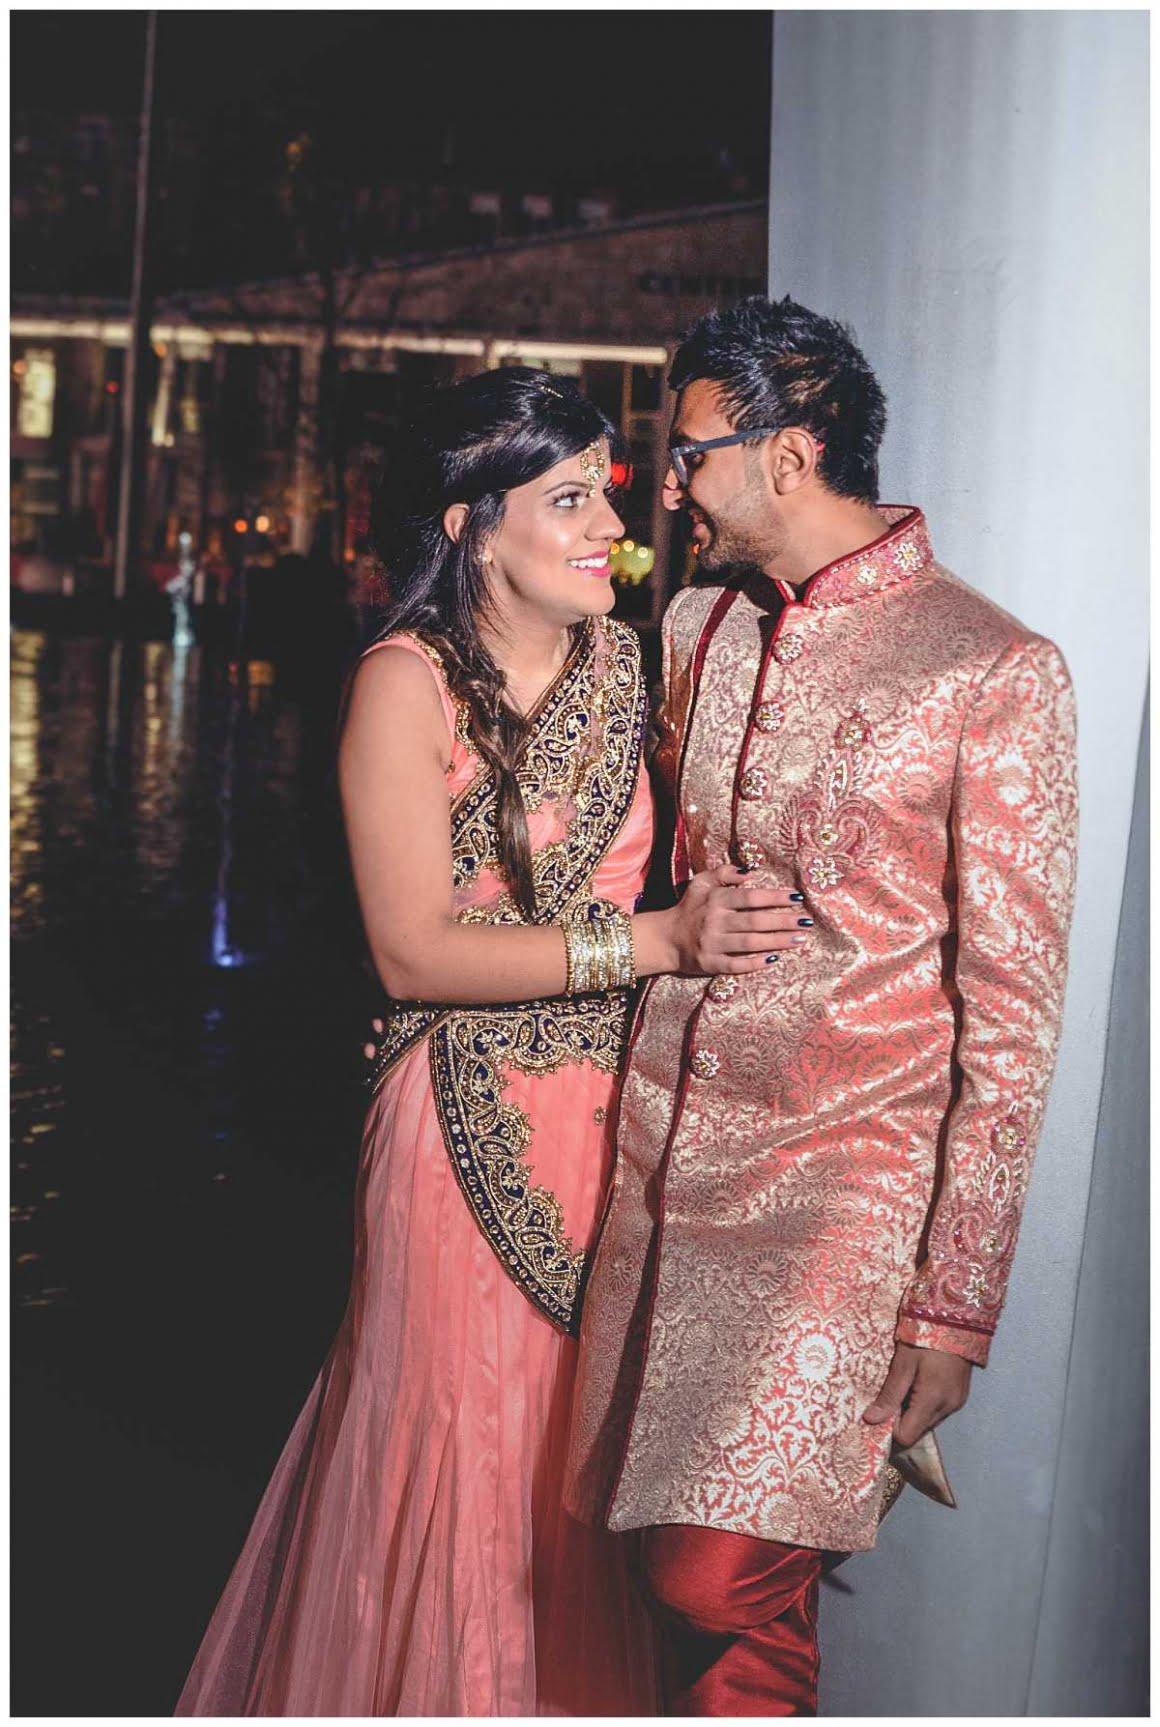 Indian Wedding shoot on Bradford City Square.